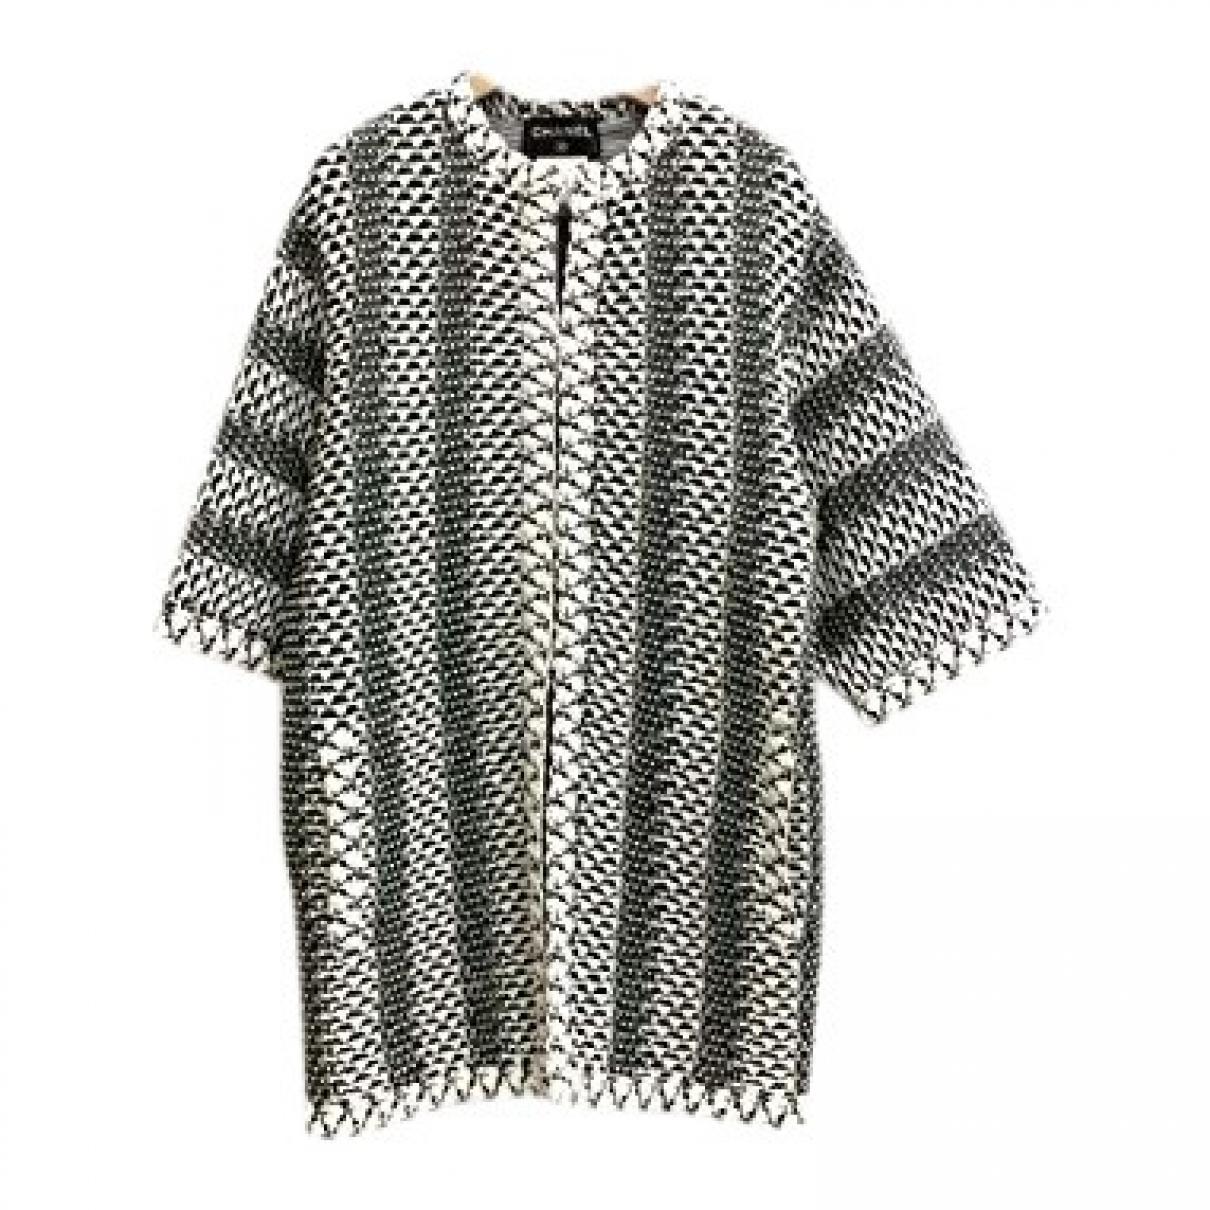 Chanel \N Jacke in  Grau Baumwolle